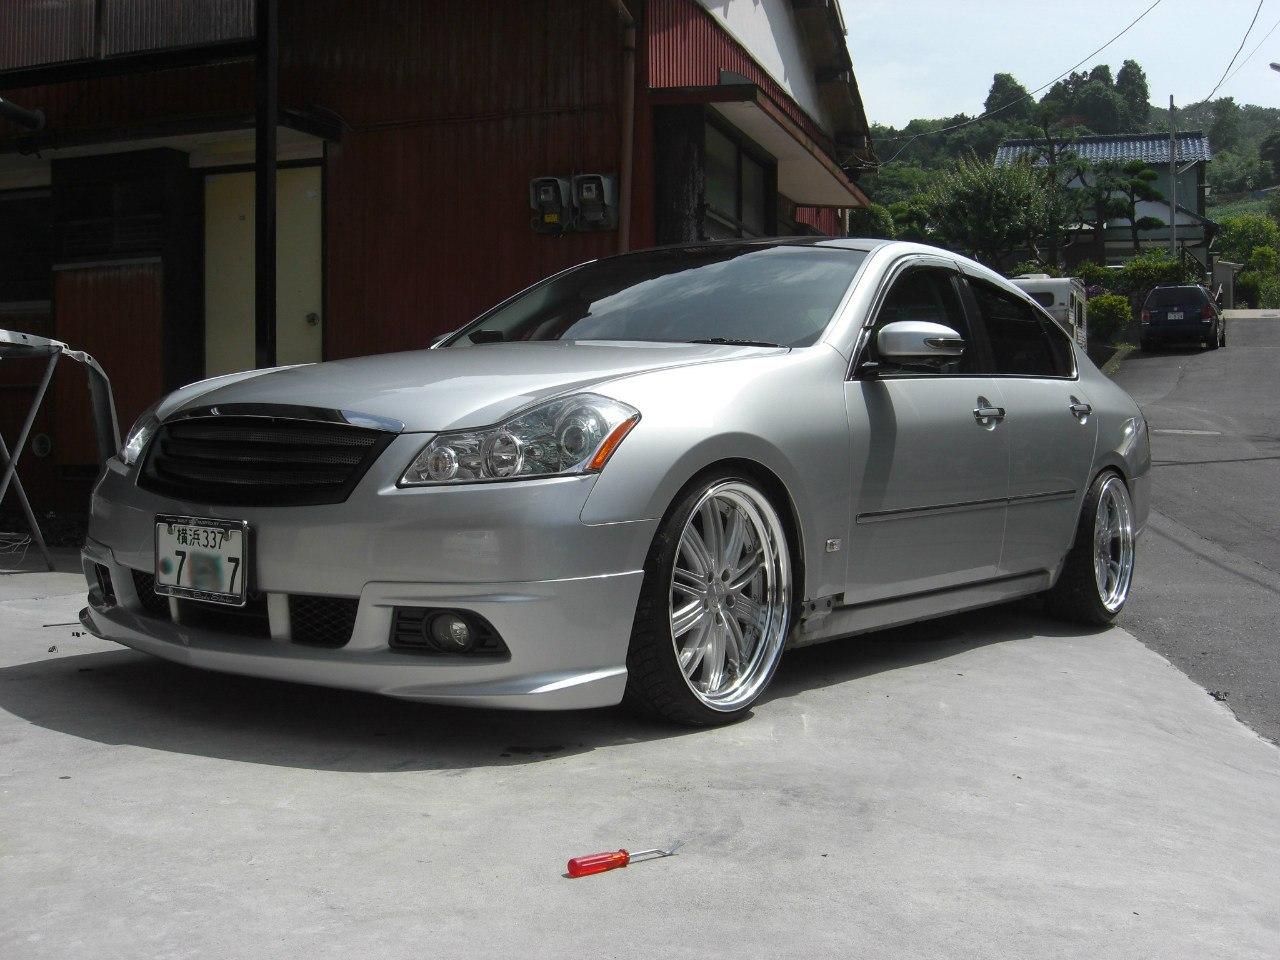 Nissan Fuga Impul 2010